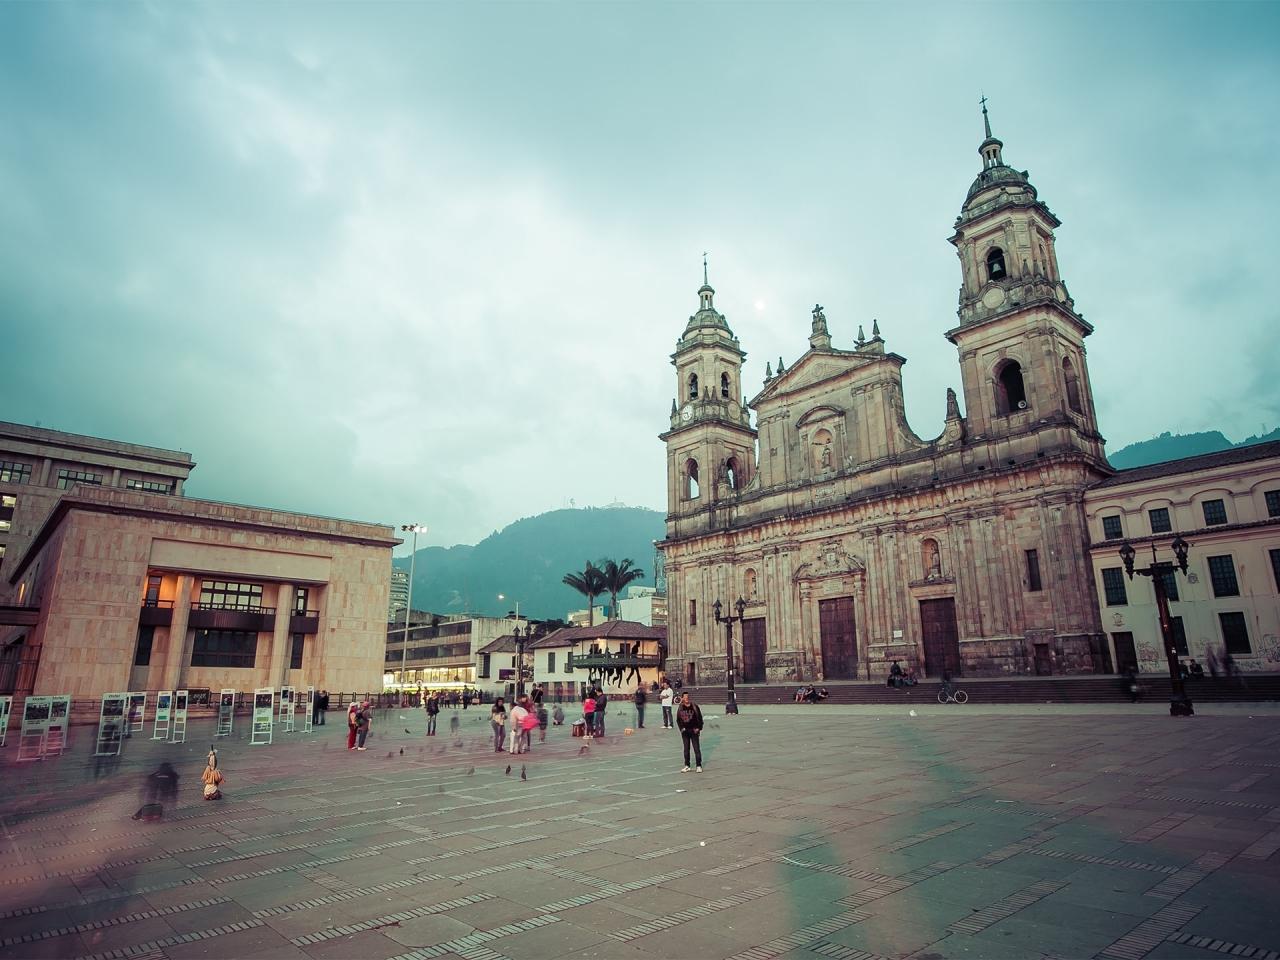 615422120 - main square with church, Bolivar square in Bogota, Colombia, Latin America